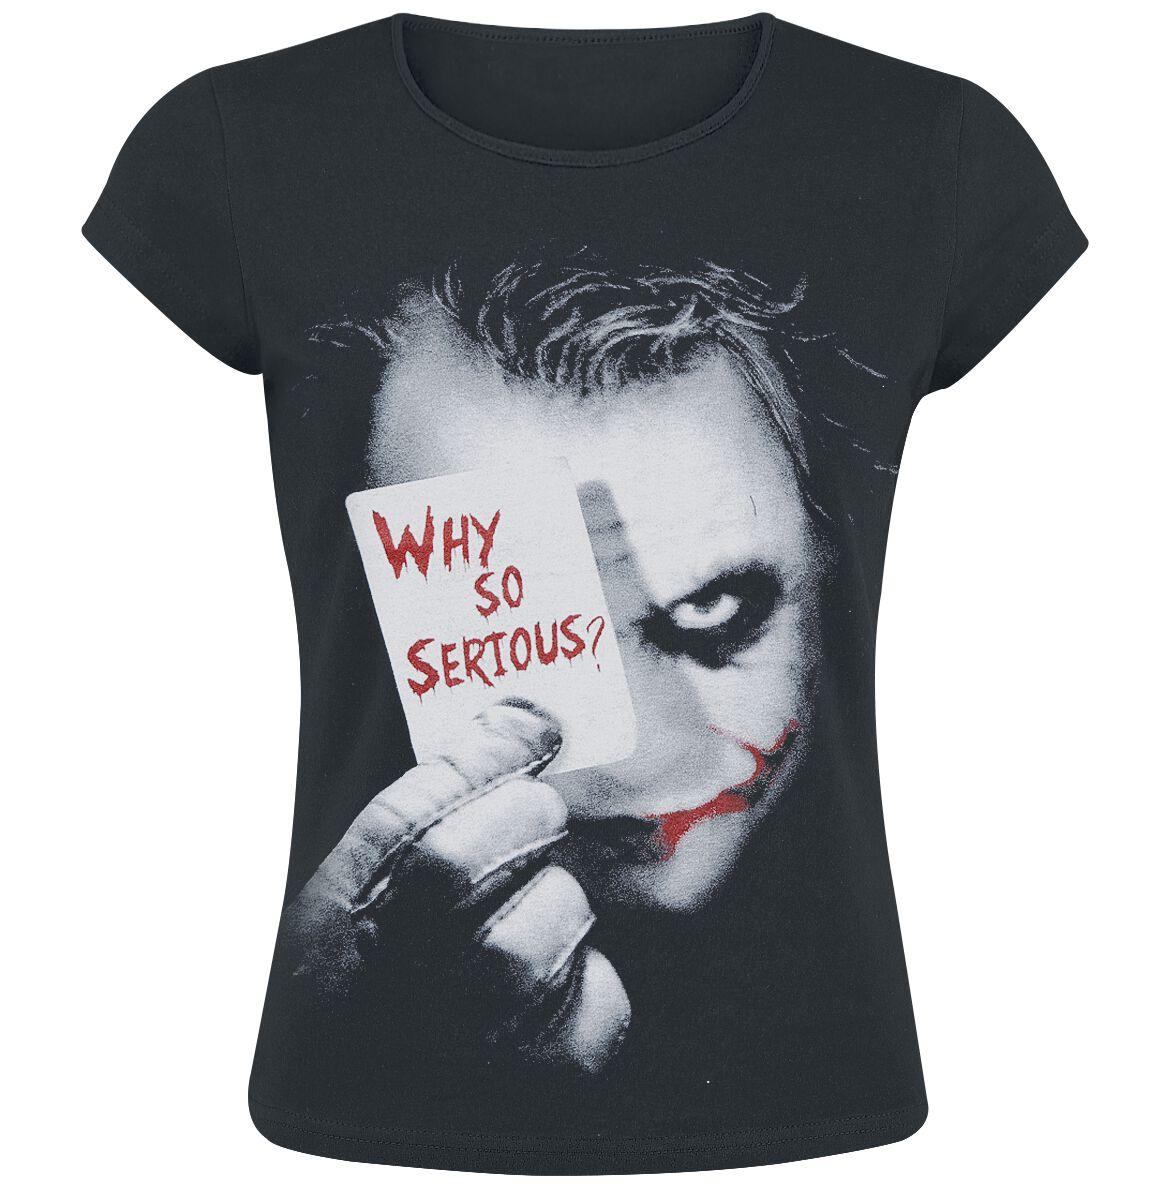 Merch dla Fanów - Koszulki - Koszulka damska The Joker Why So Serious? Koszulka damska czarny - 292299